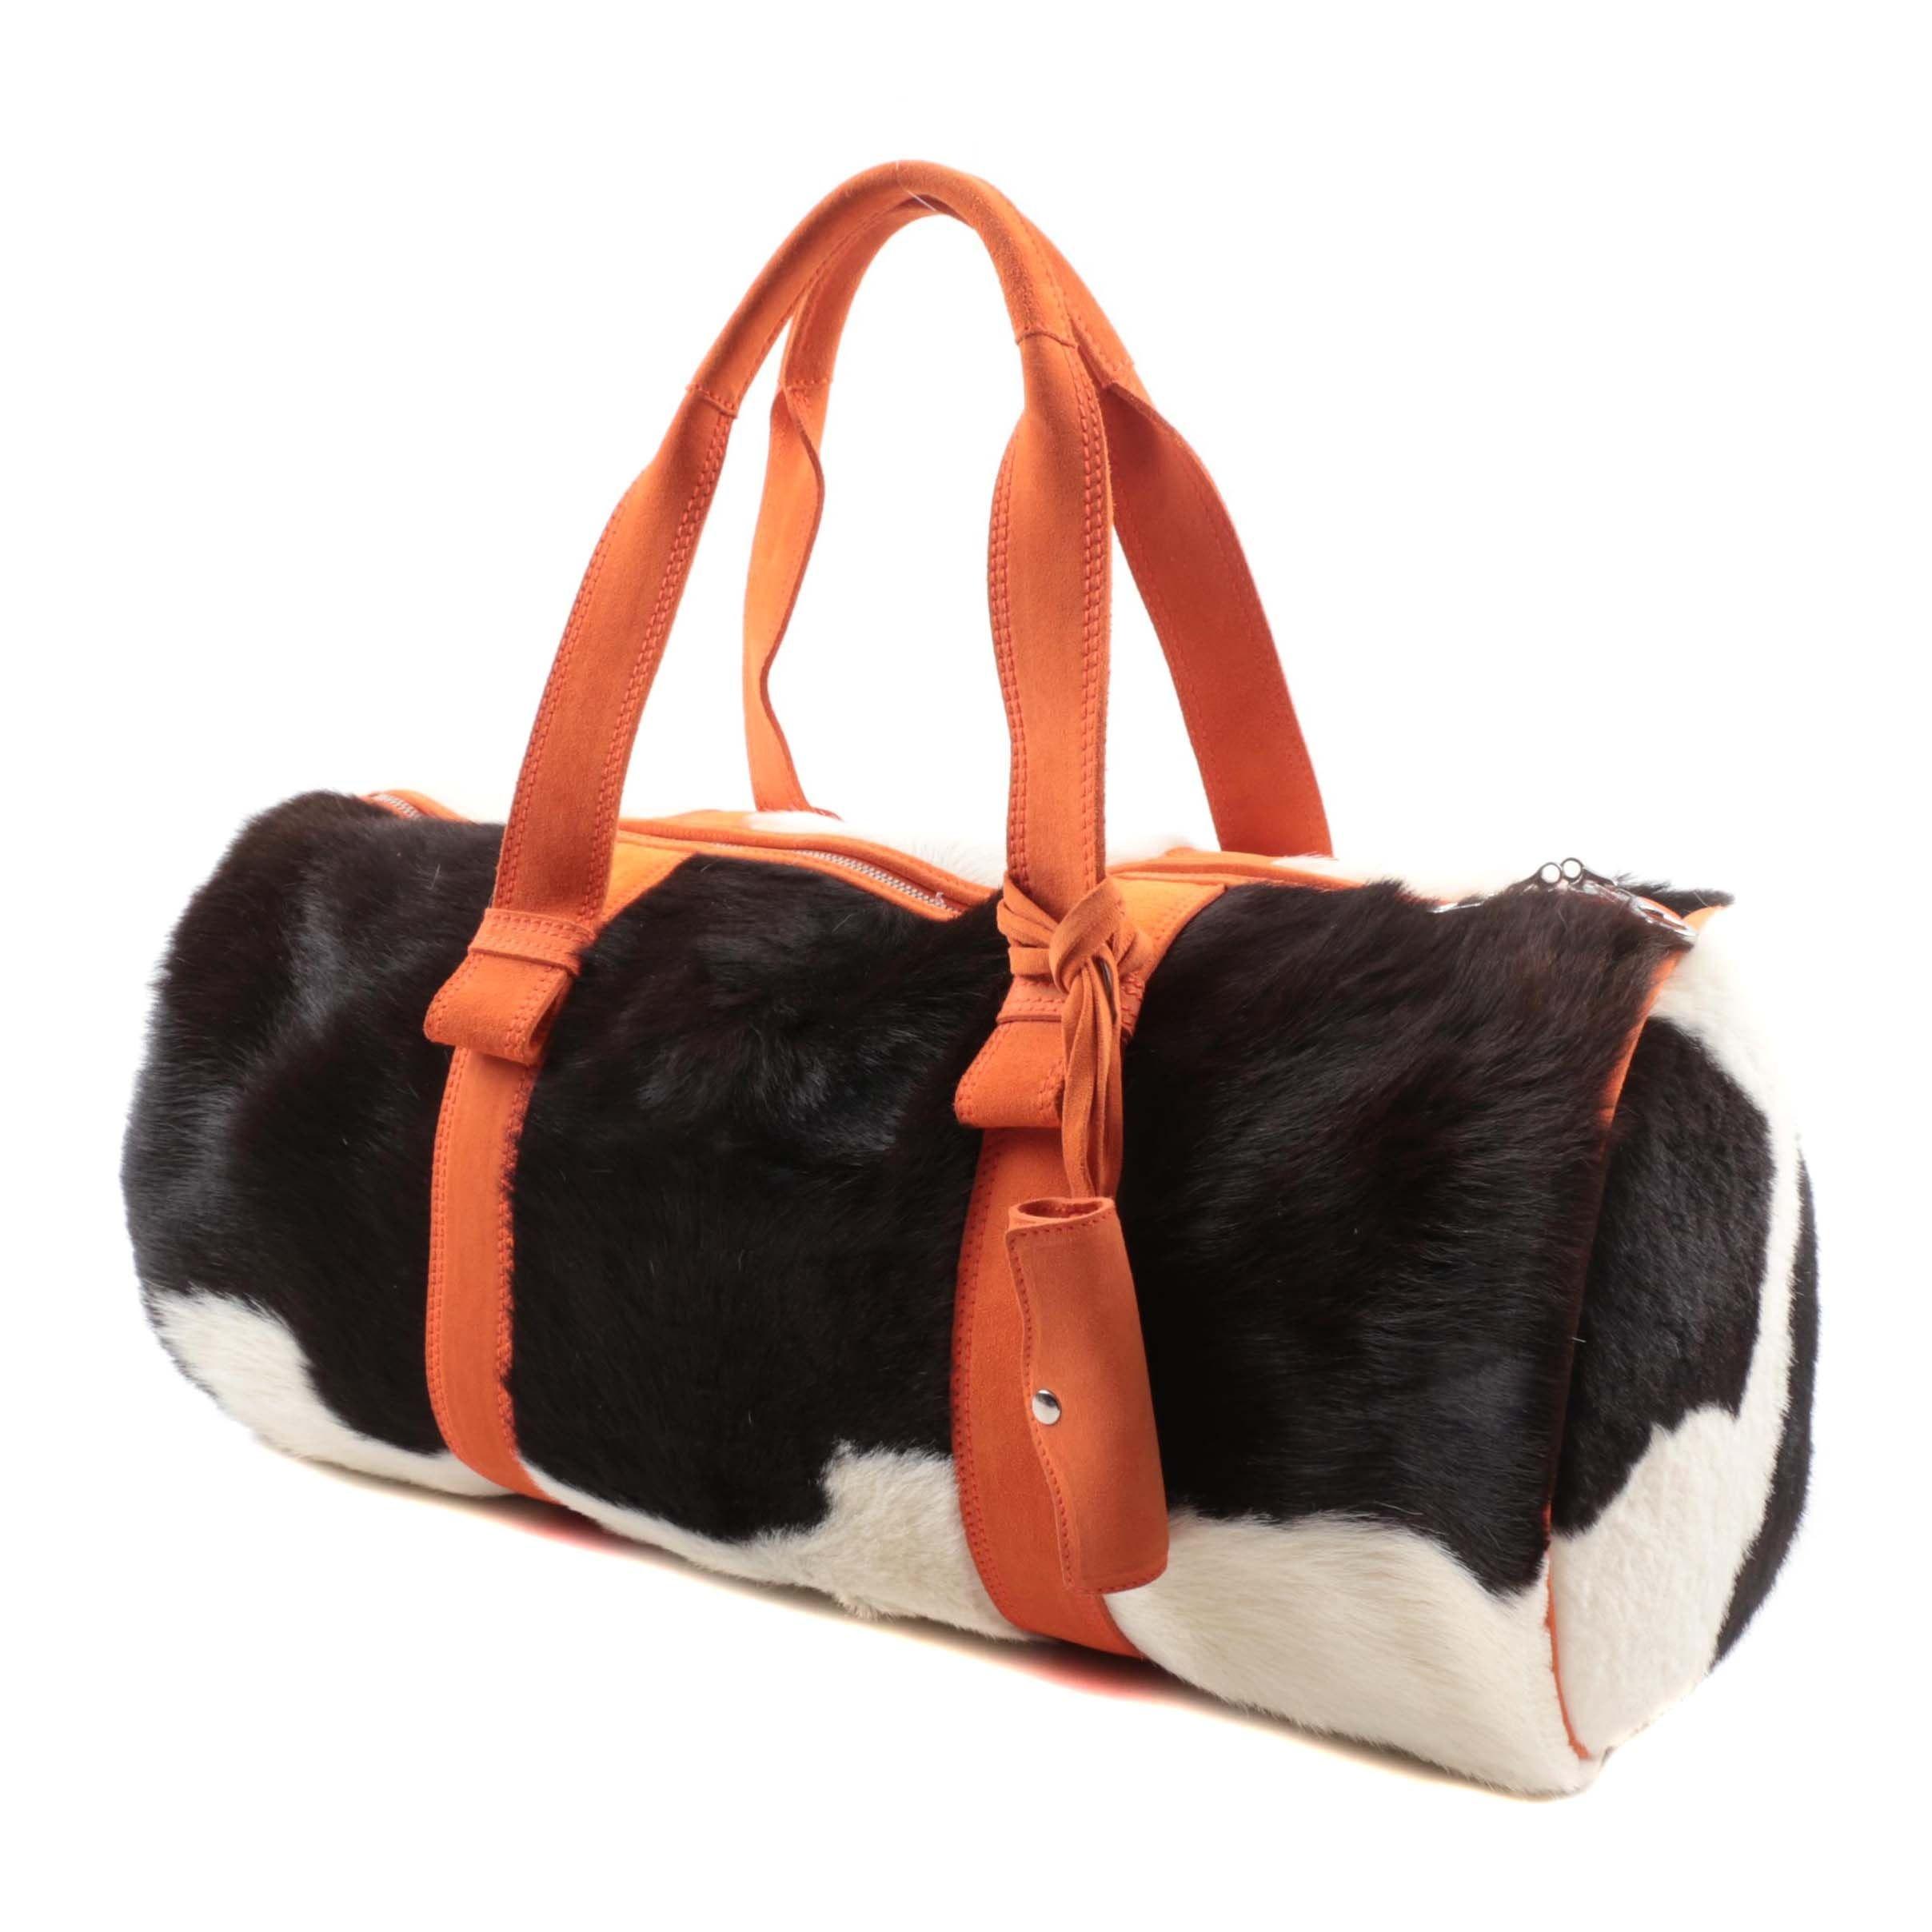 Bottega Veneta Calf Hair and Orange Leather Weekend Duffel Bag